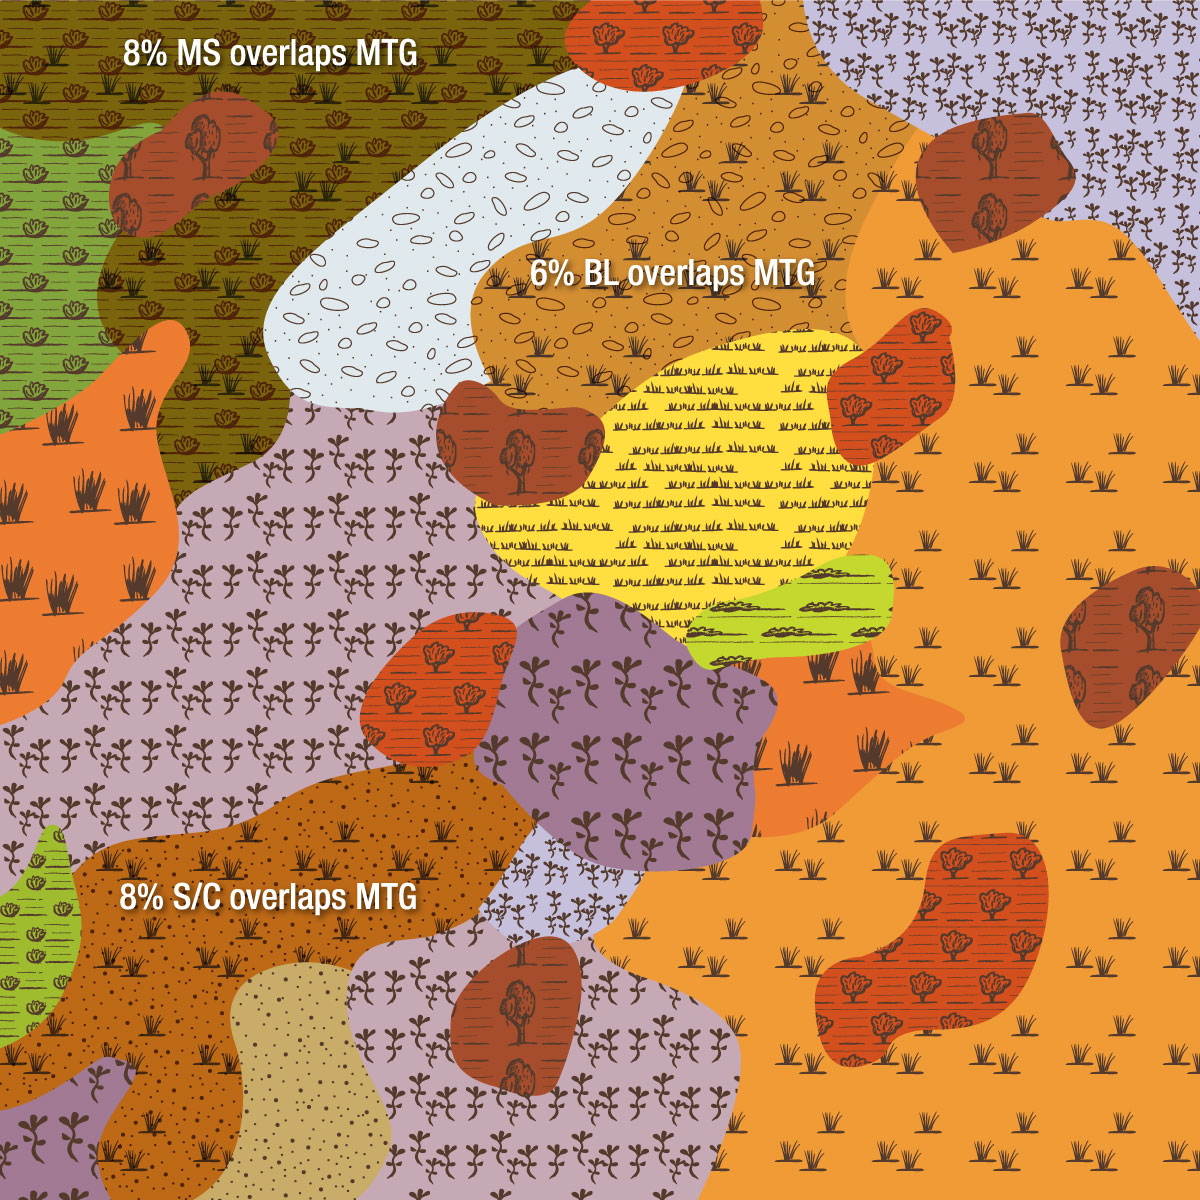 EVC 55_61 Plains Grassy Woodland image